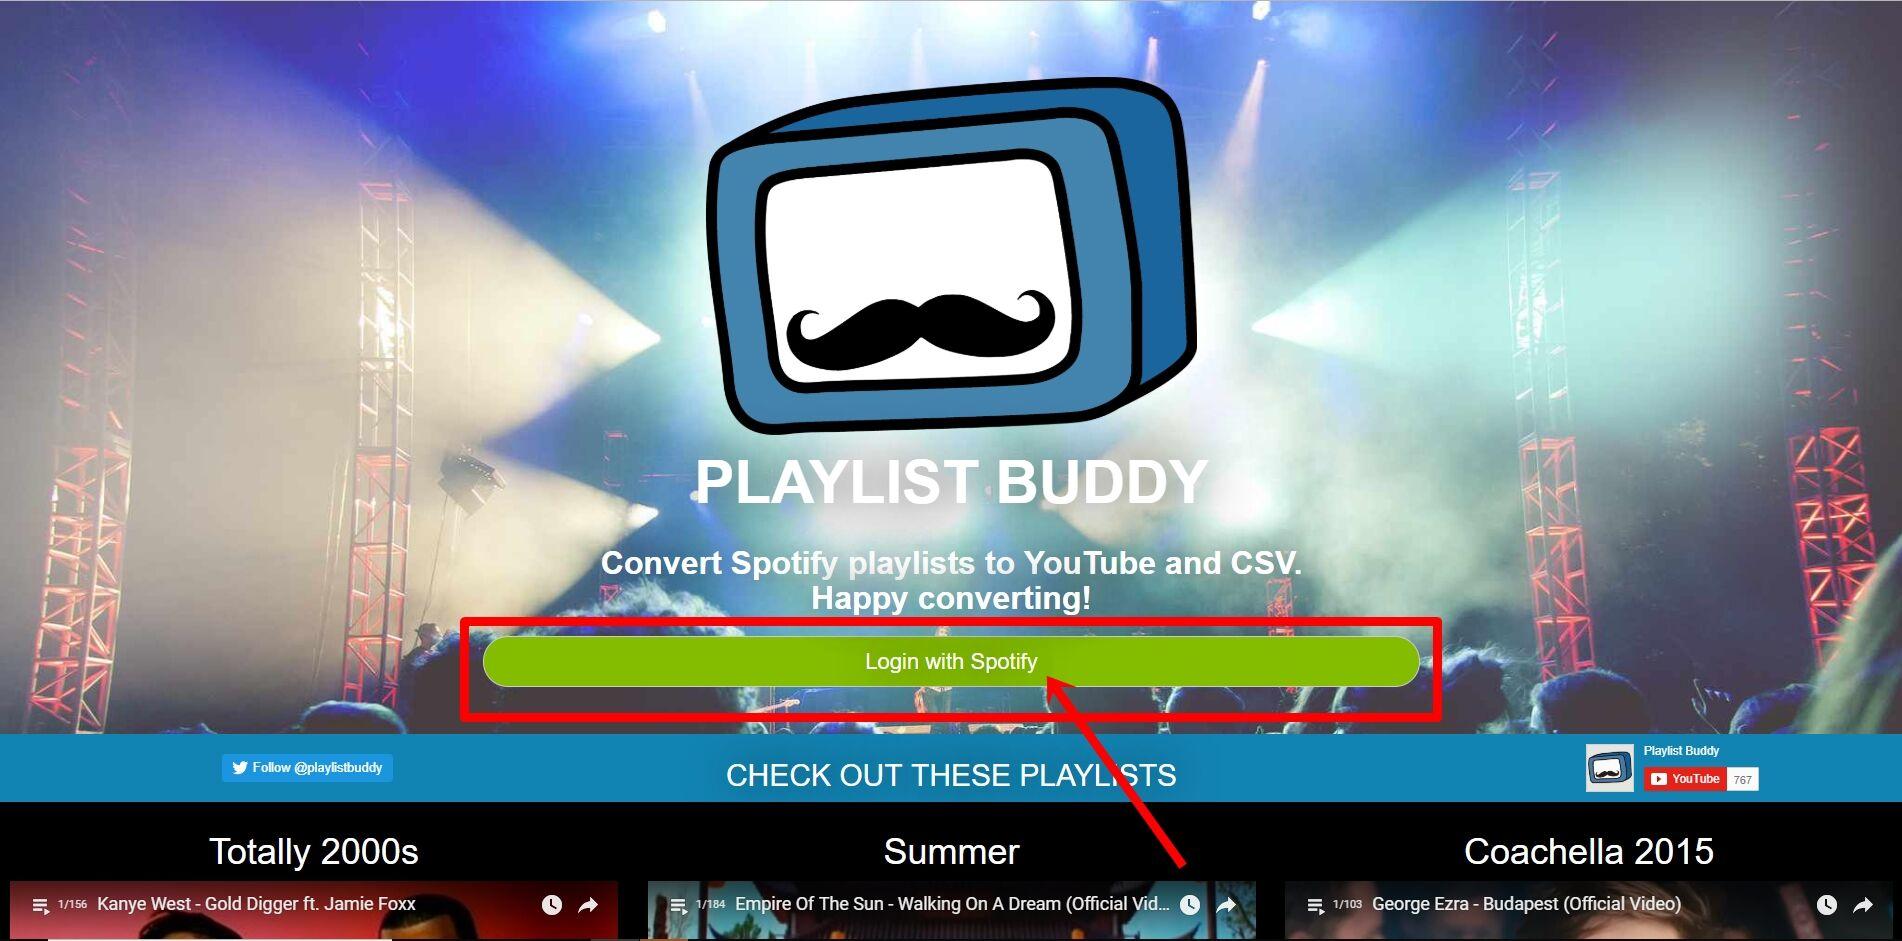 Cara Mengubah Playlist Spotify Menjadi Playlist YouTube 1 4372b